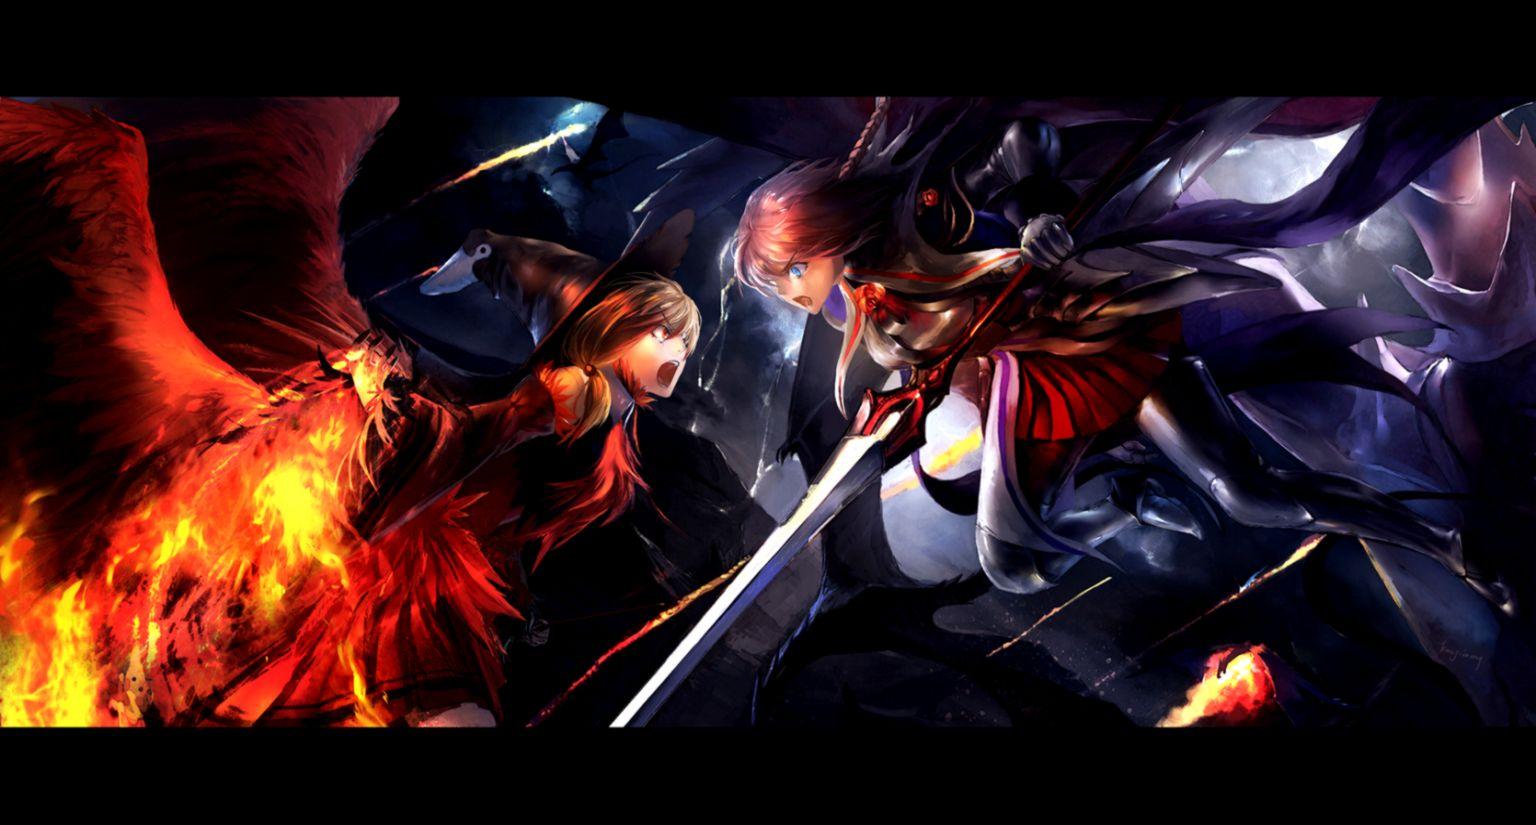 Epic anime wallpaper wallpapersafari - Epic anime pics ...